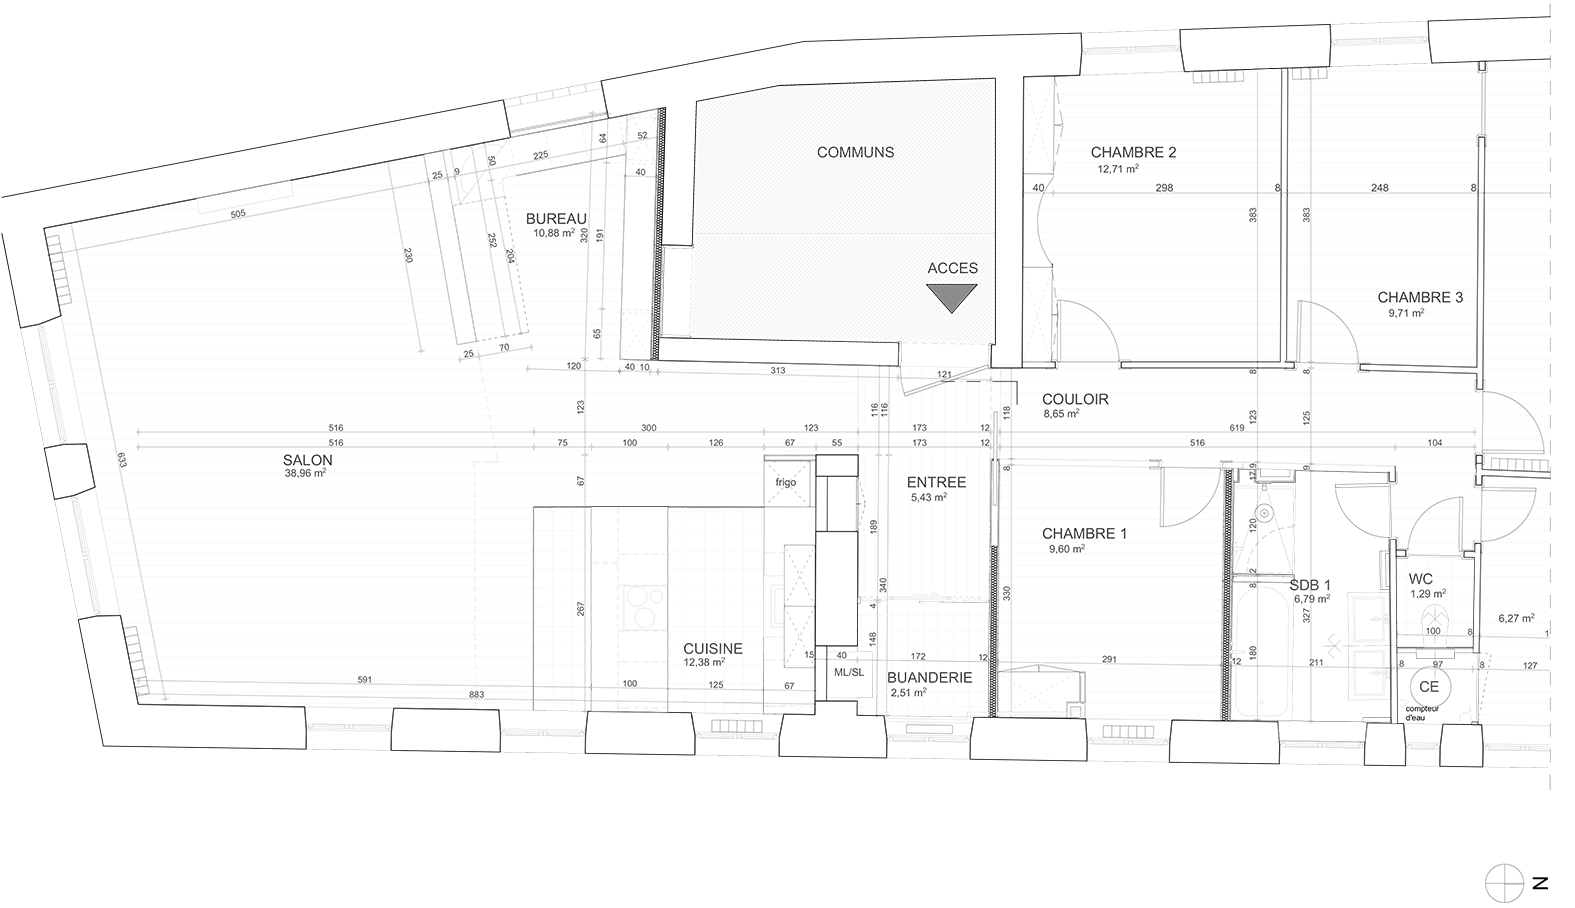 voyageur-noesis-architecture-plan-projet-renovation